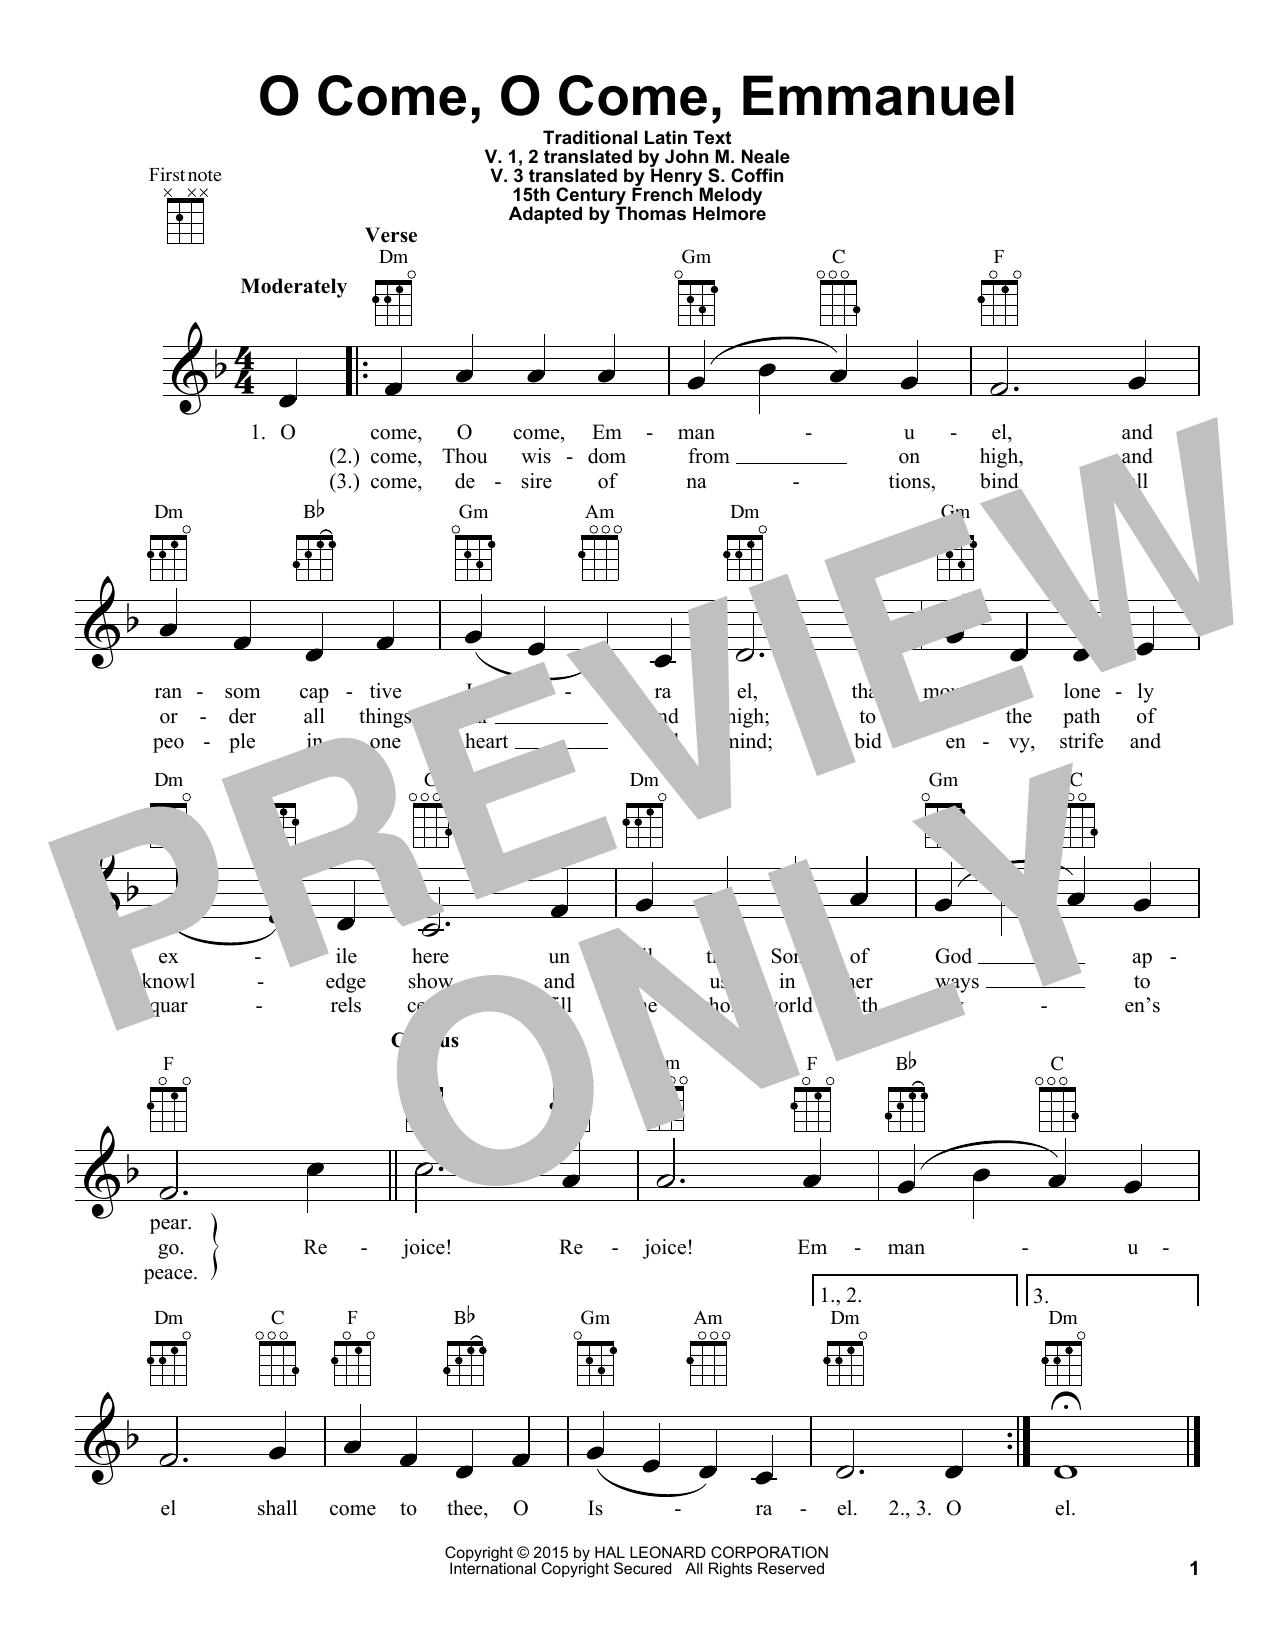 Traditional Carol O Come, O Come, Emmanuel sheet music notes and chords